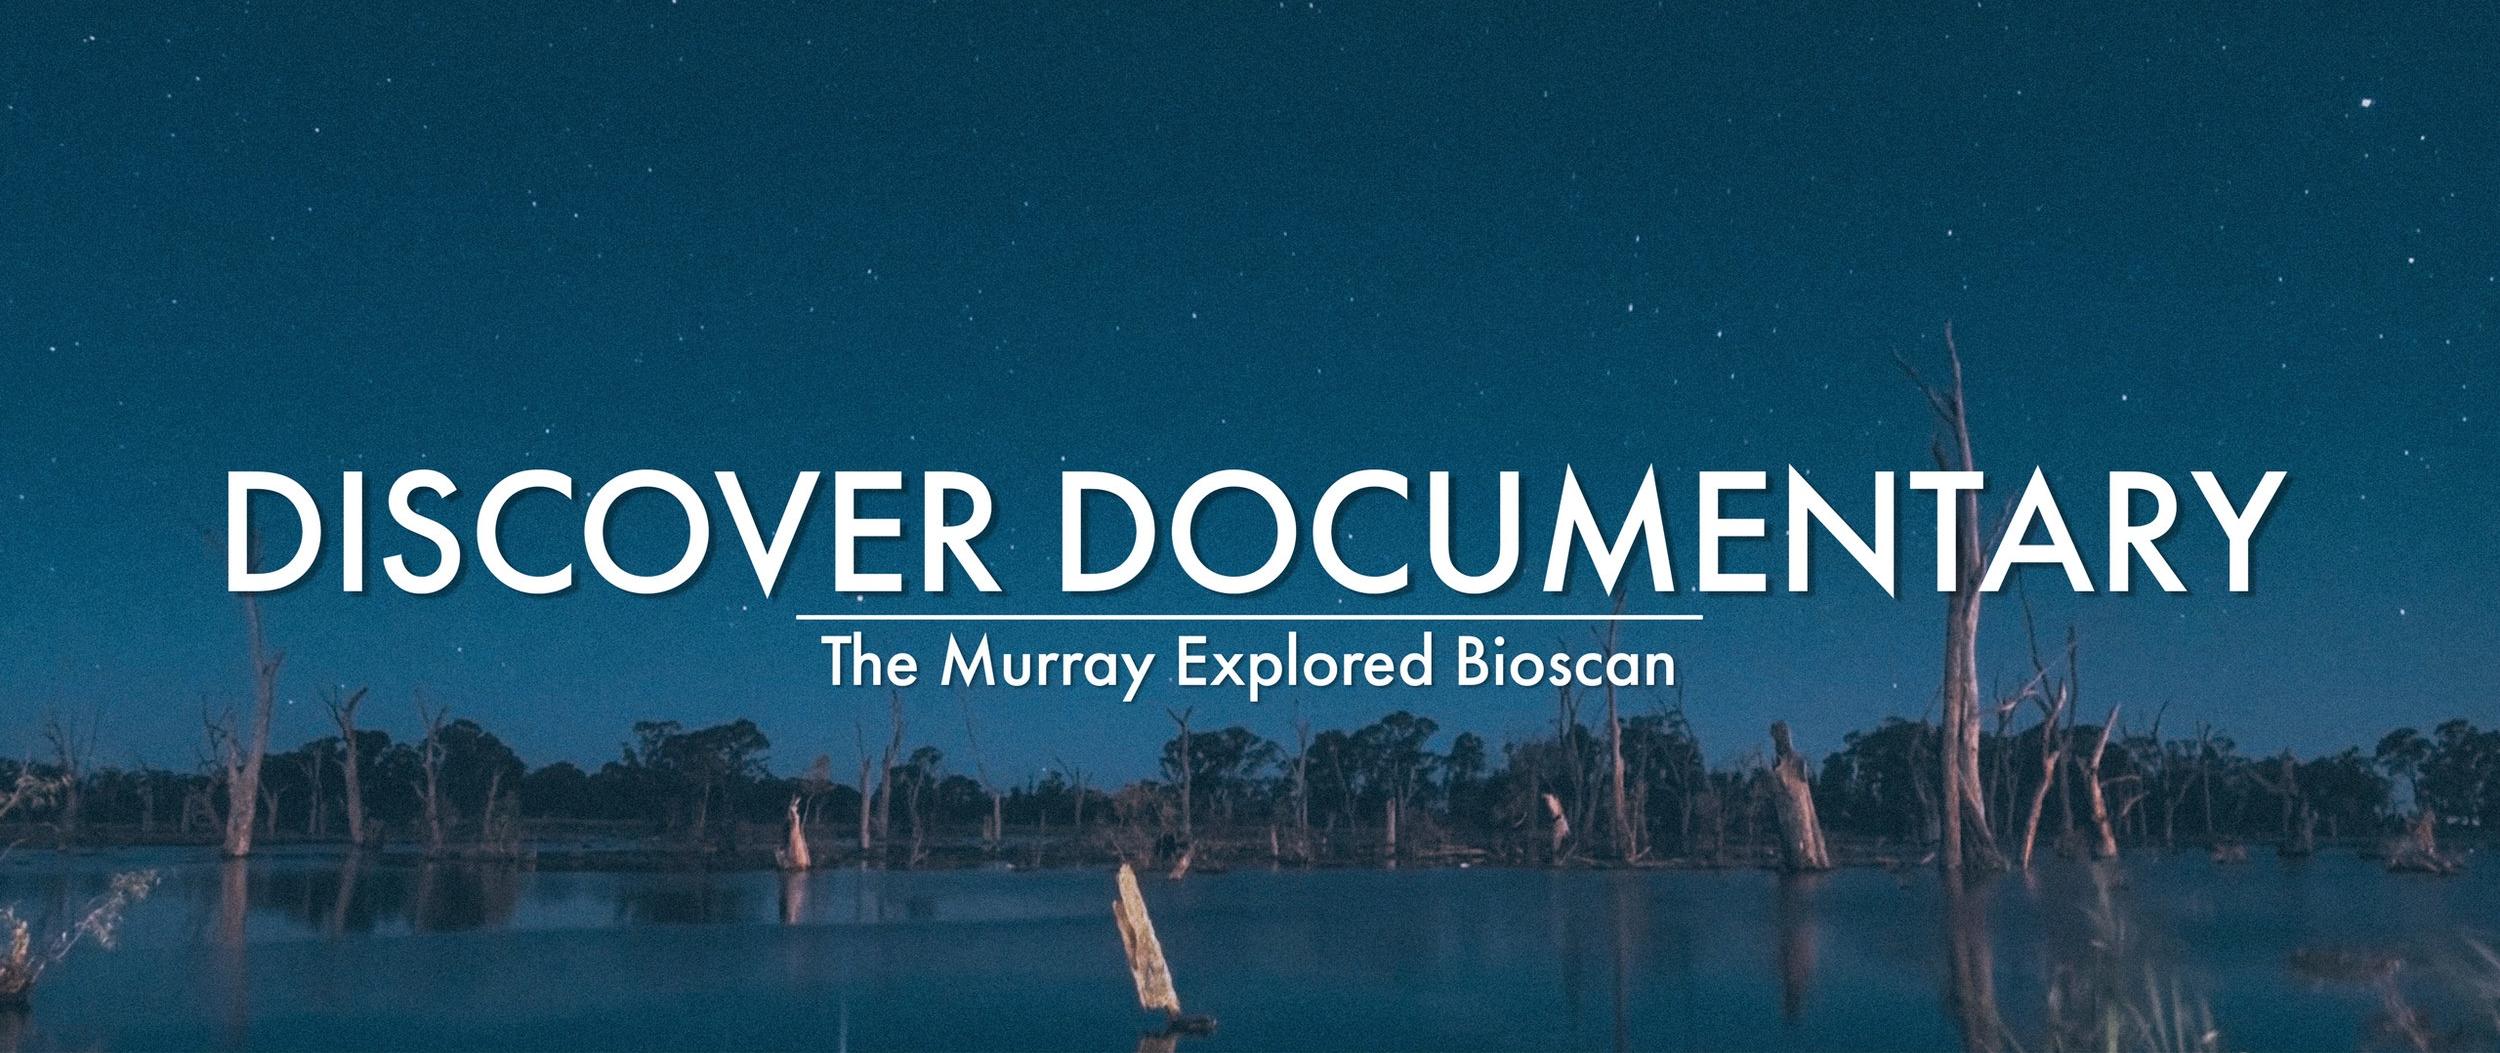 discoverdoco1.jpg